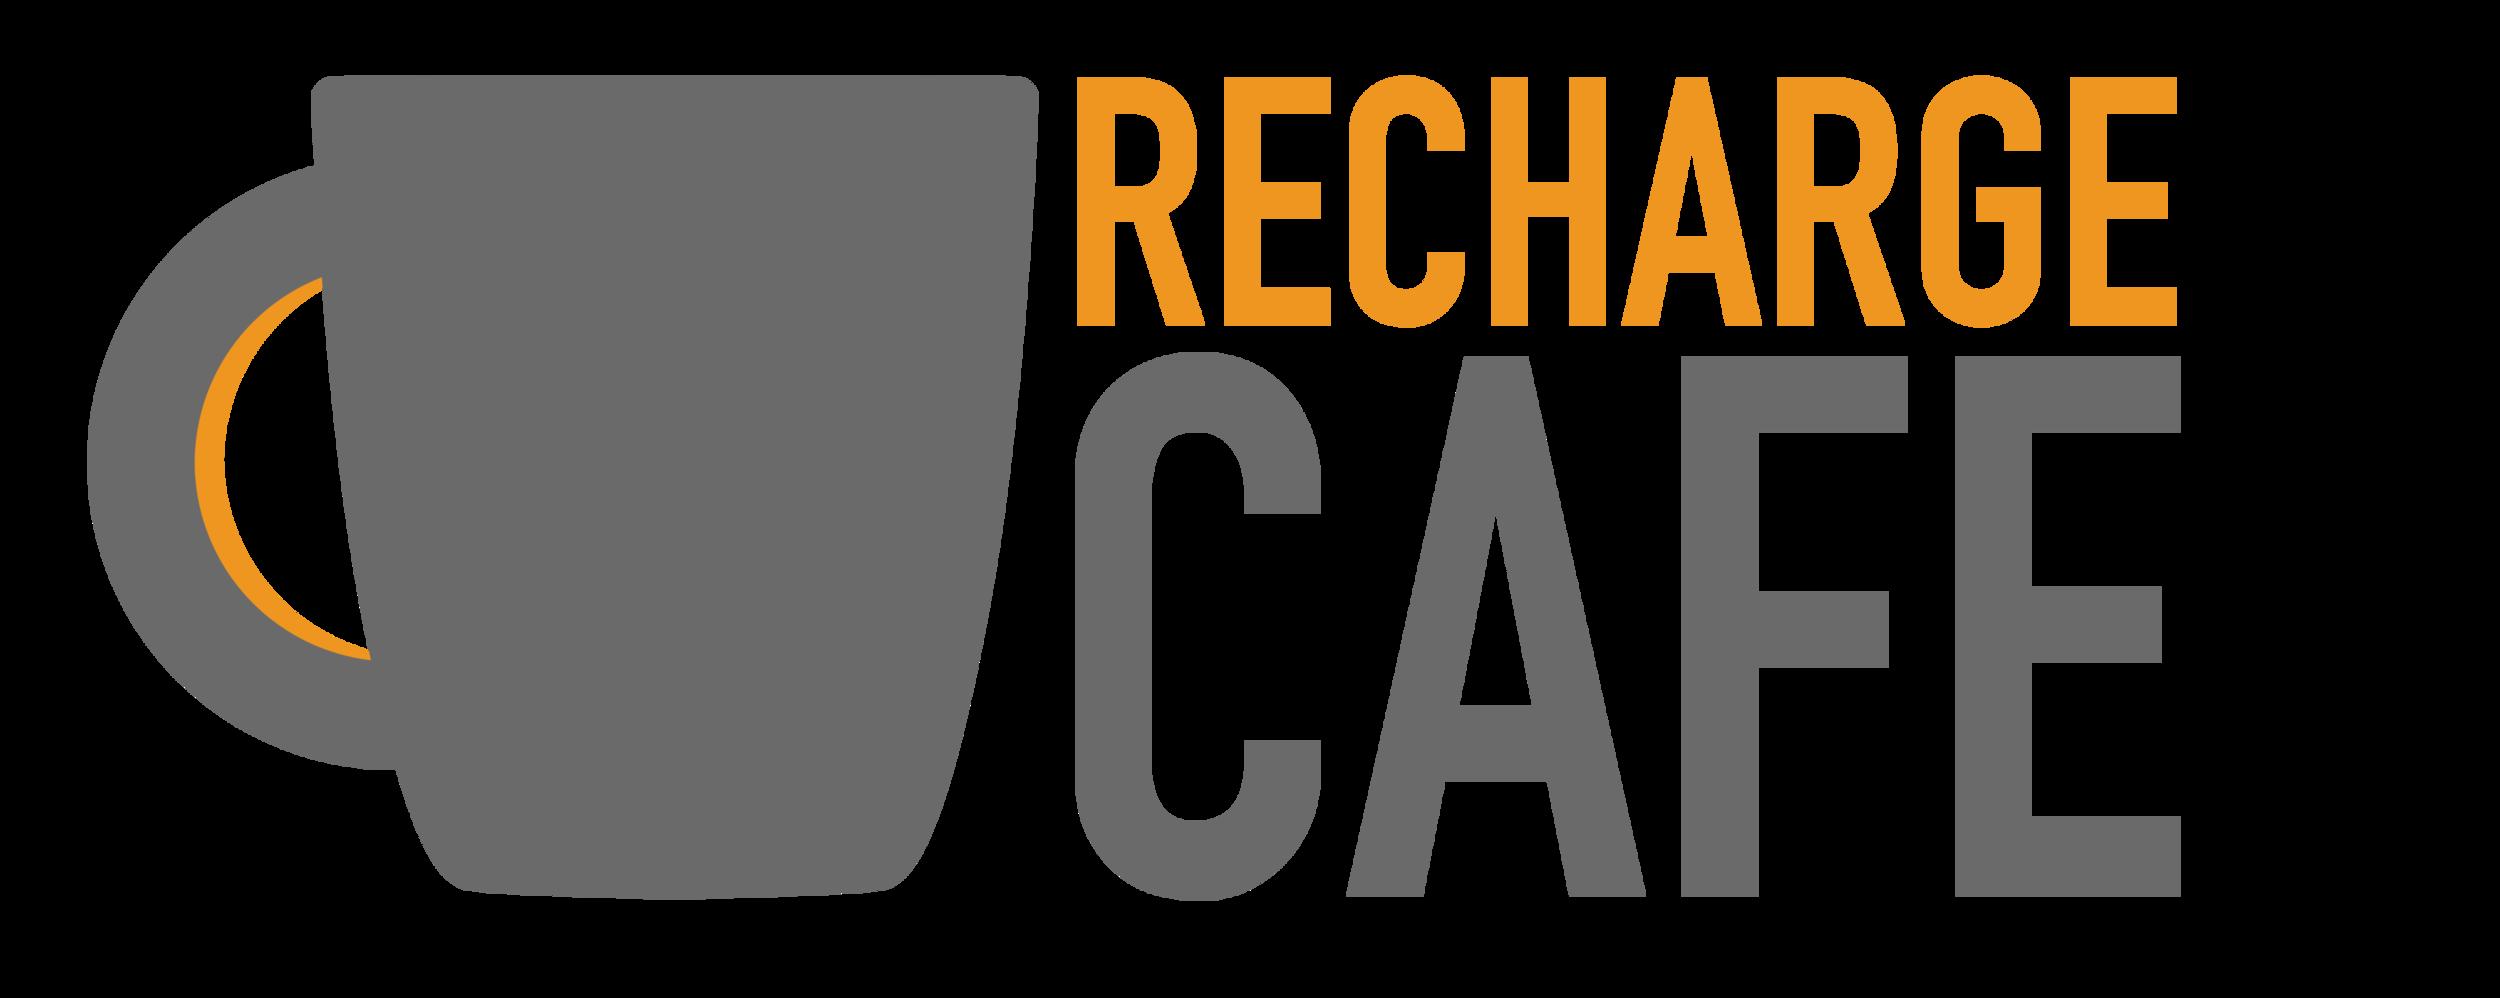 recharge_cafe_grey_xero.png